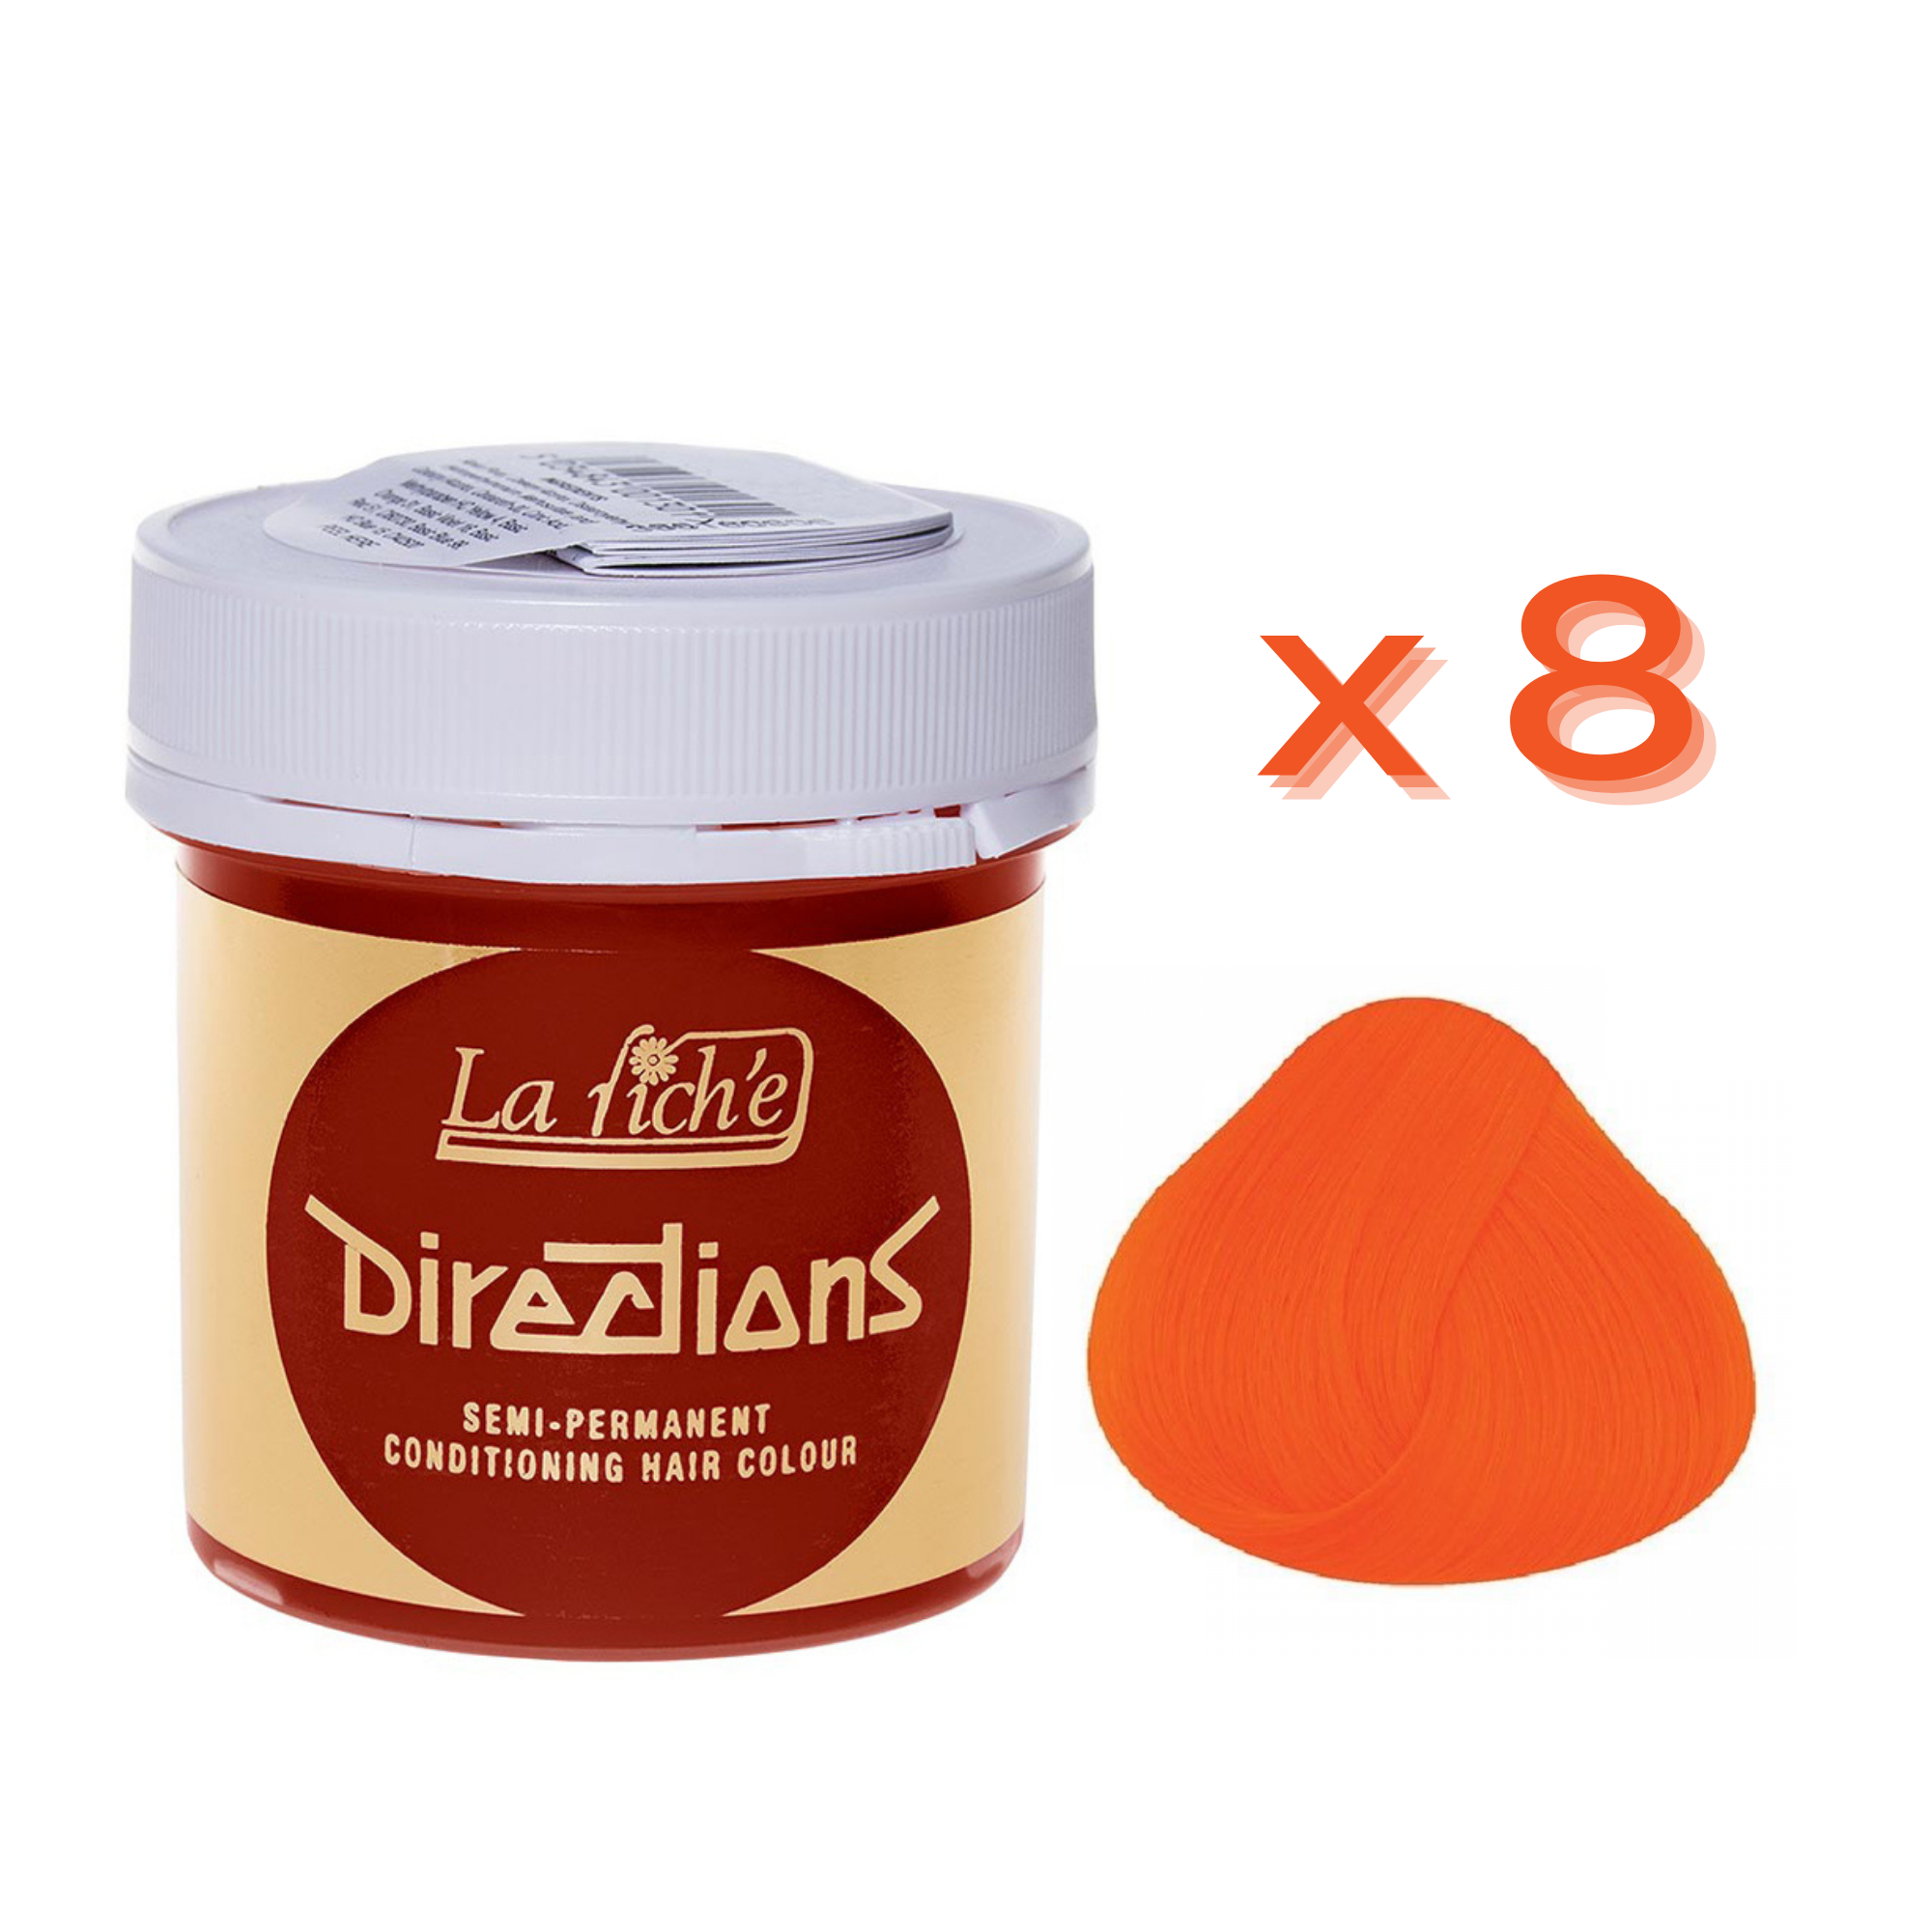 8 x La Riche Directions Semi-Permanent Hair Color 88ml Tubs - MANDARIN